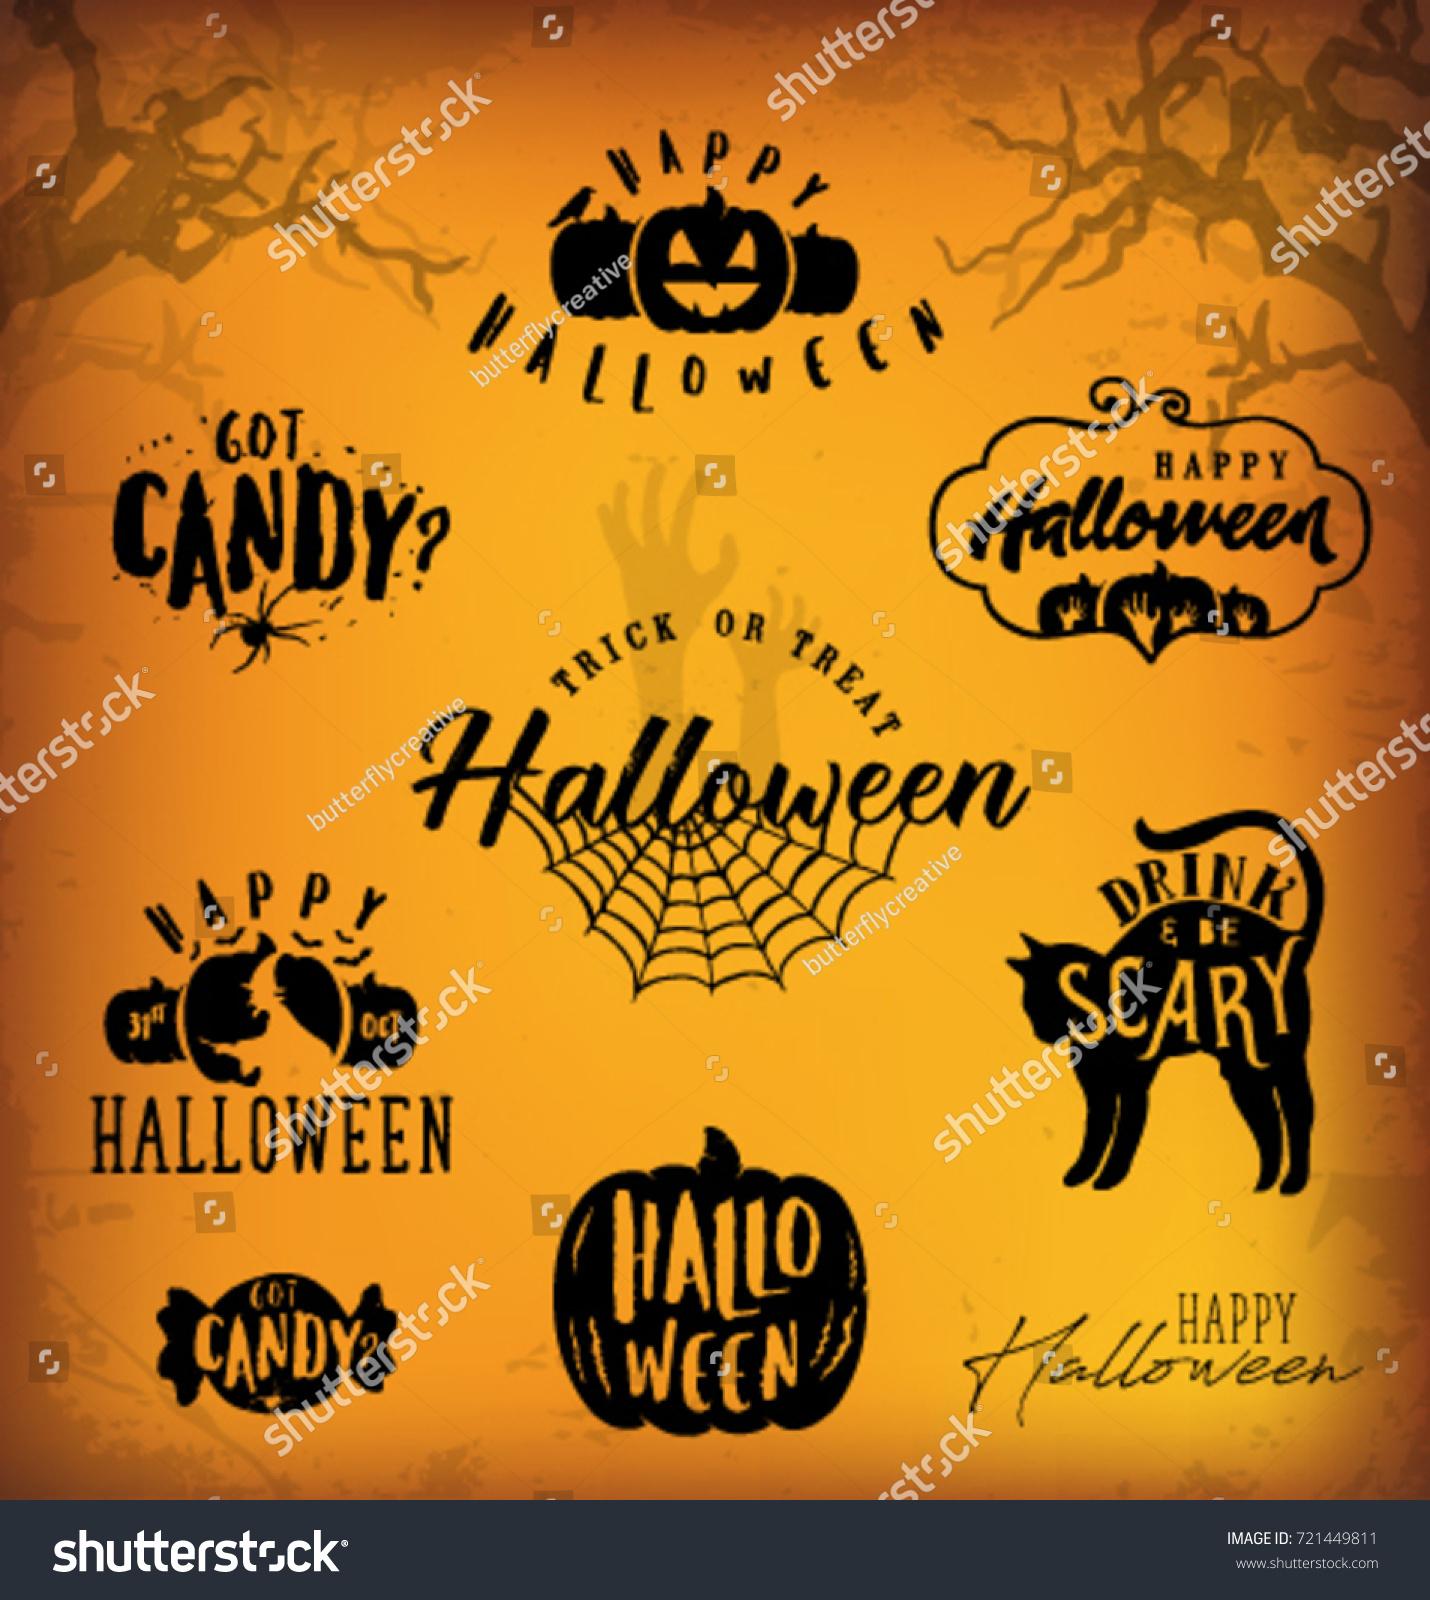 Halloween Design Elements Parties Greeting Cards Stock Vector